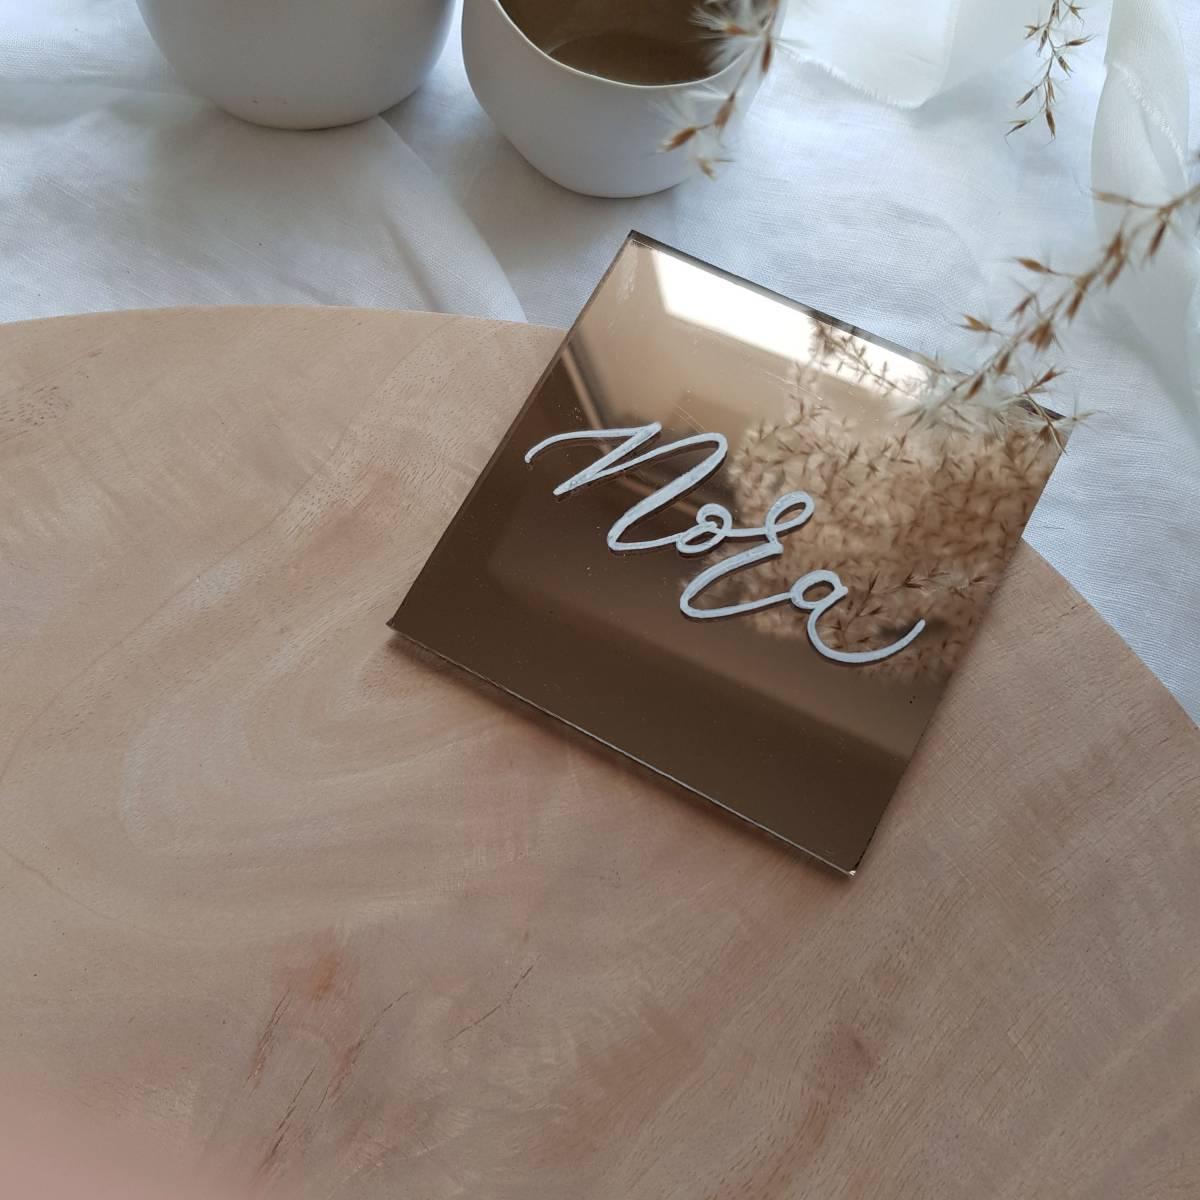 Touch of Gold - Workshops - Vrijgezellen - Trouwuitnodiging - Huwelijksuitnodiging - Kalligrafie - House of Weddings - 4